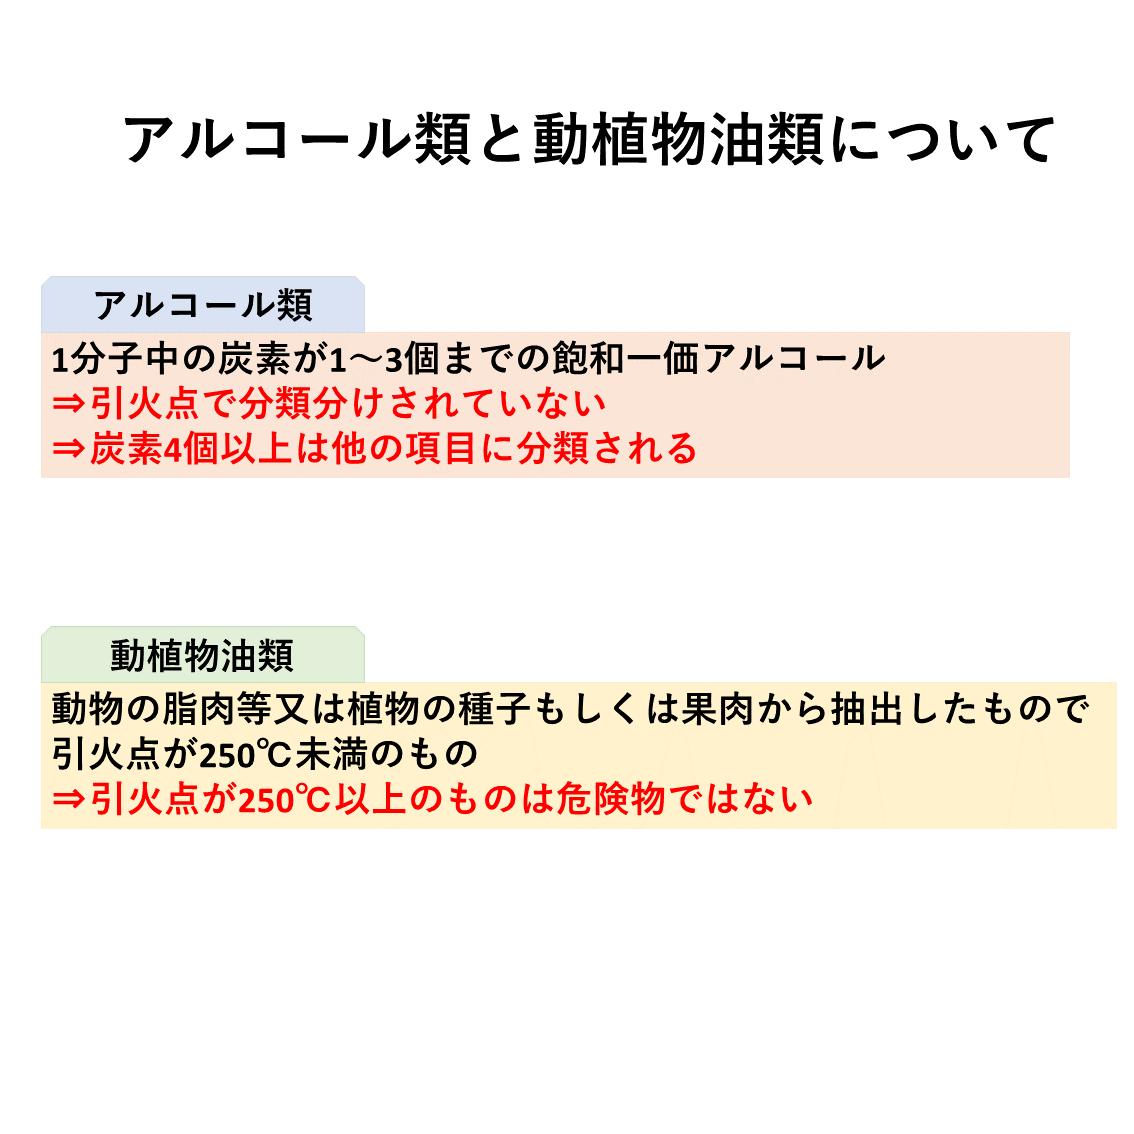 f:id:Think_diary:20210930144807p:plain